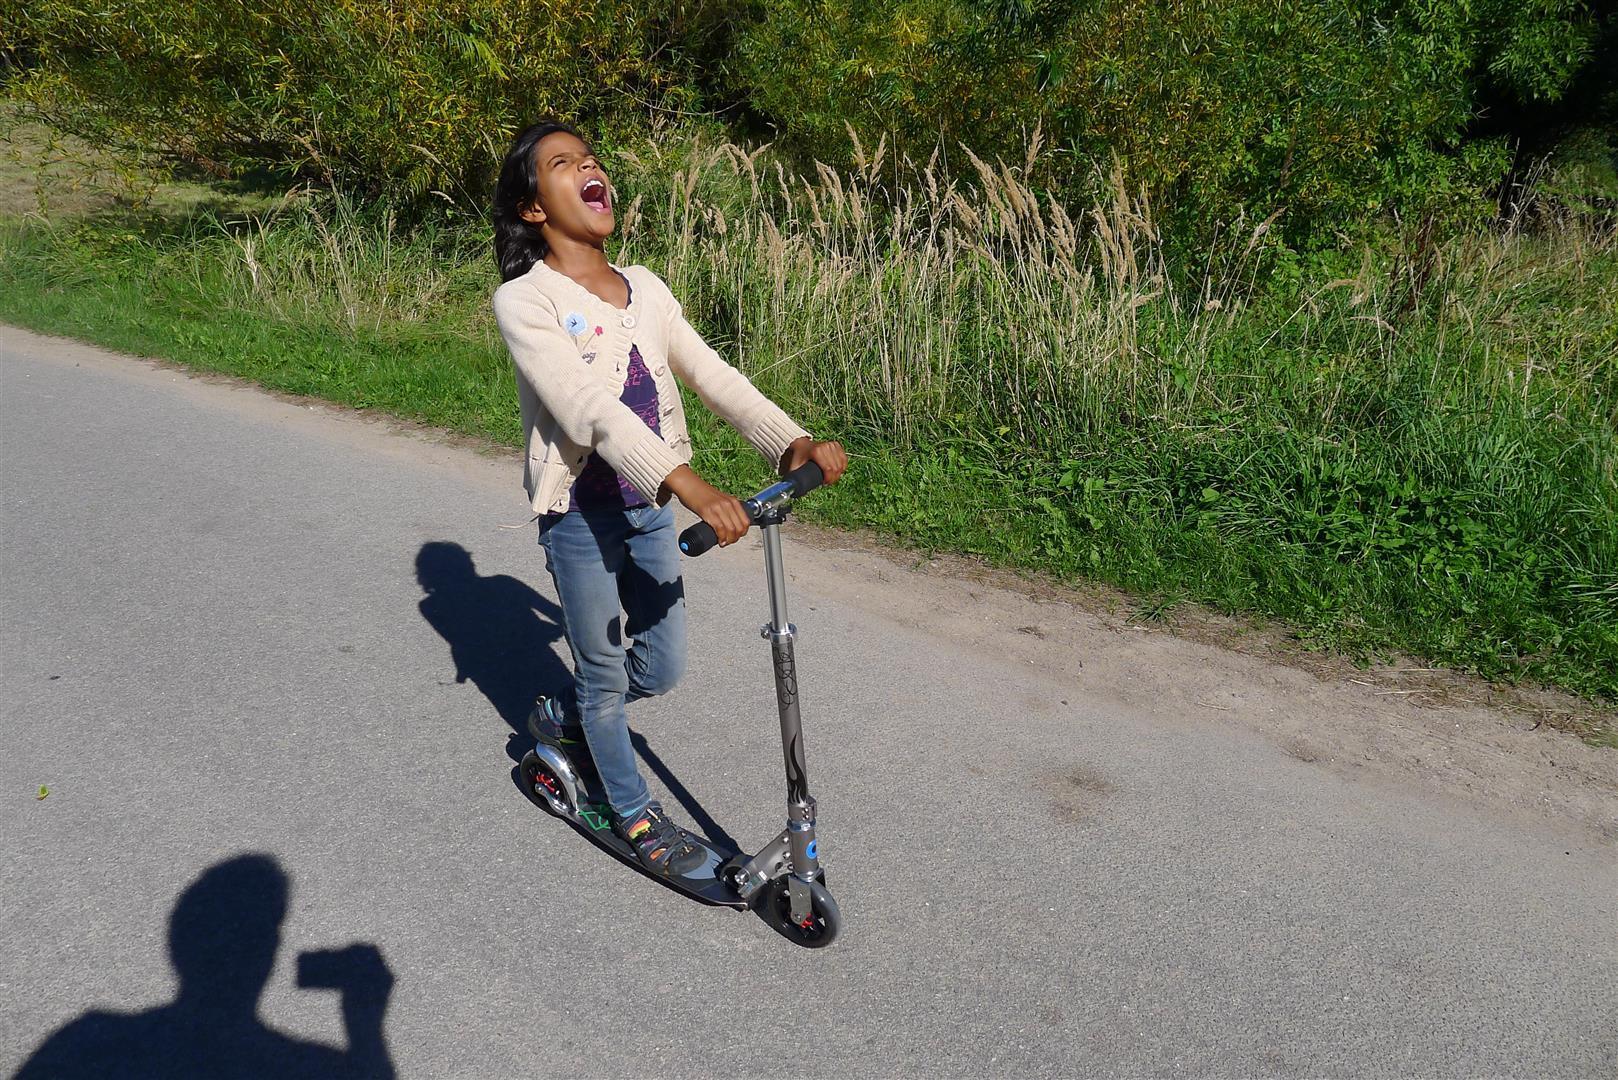 Scooter thrills